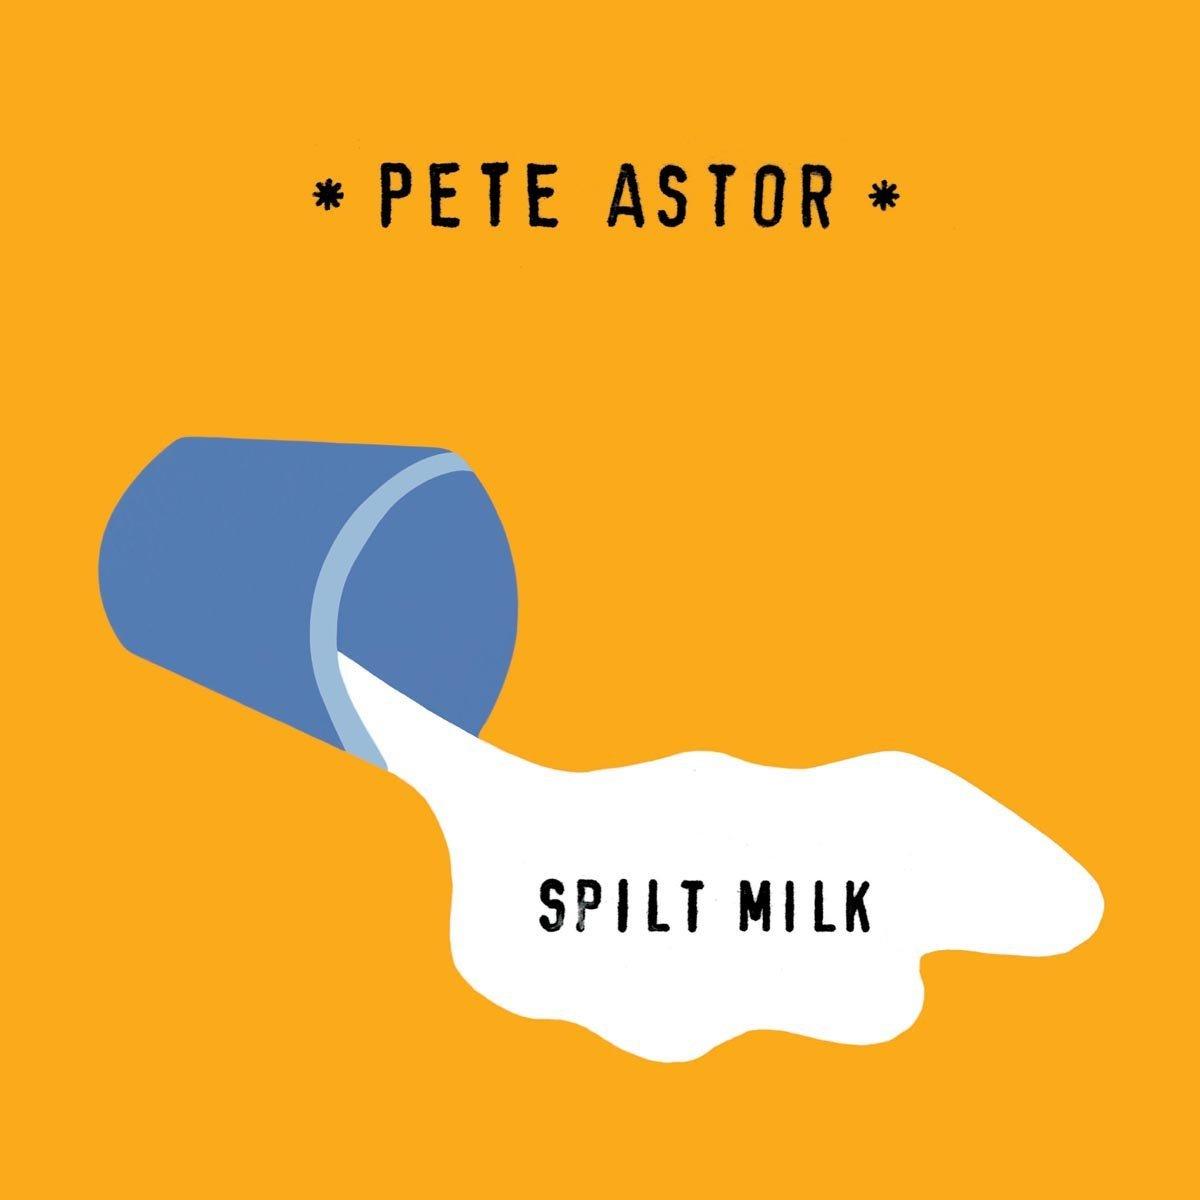 pete-astor-spilt-milk